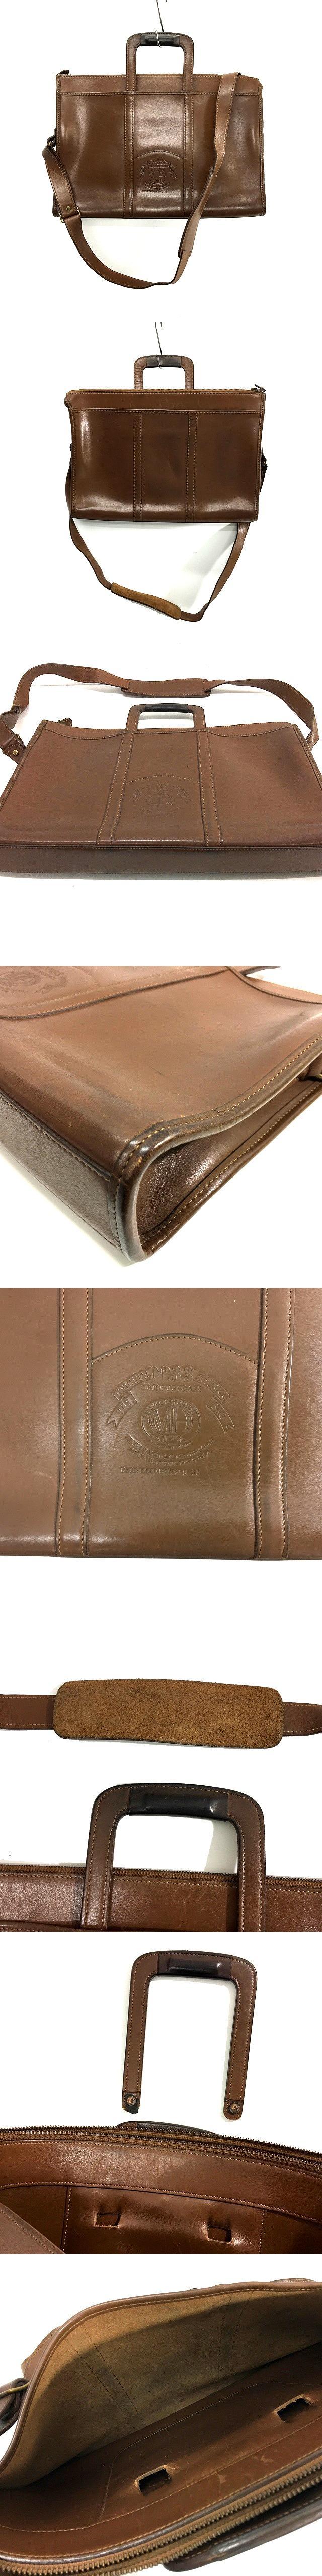 MARLEY HODSON No.33 ブリーフケース 2WAY A4サイズ対応 ビジネス 茶 ブラウン ショルダー ジャンク 鞄 かばん IBS8